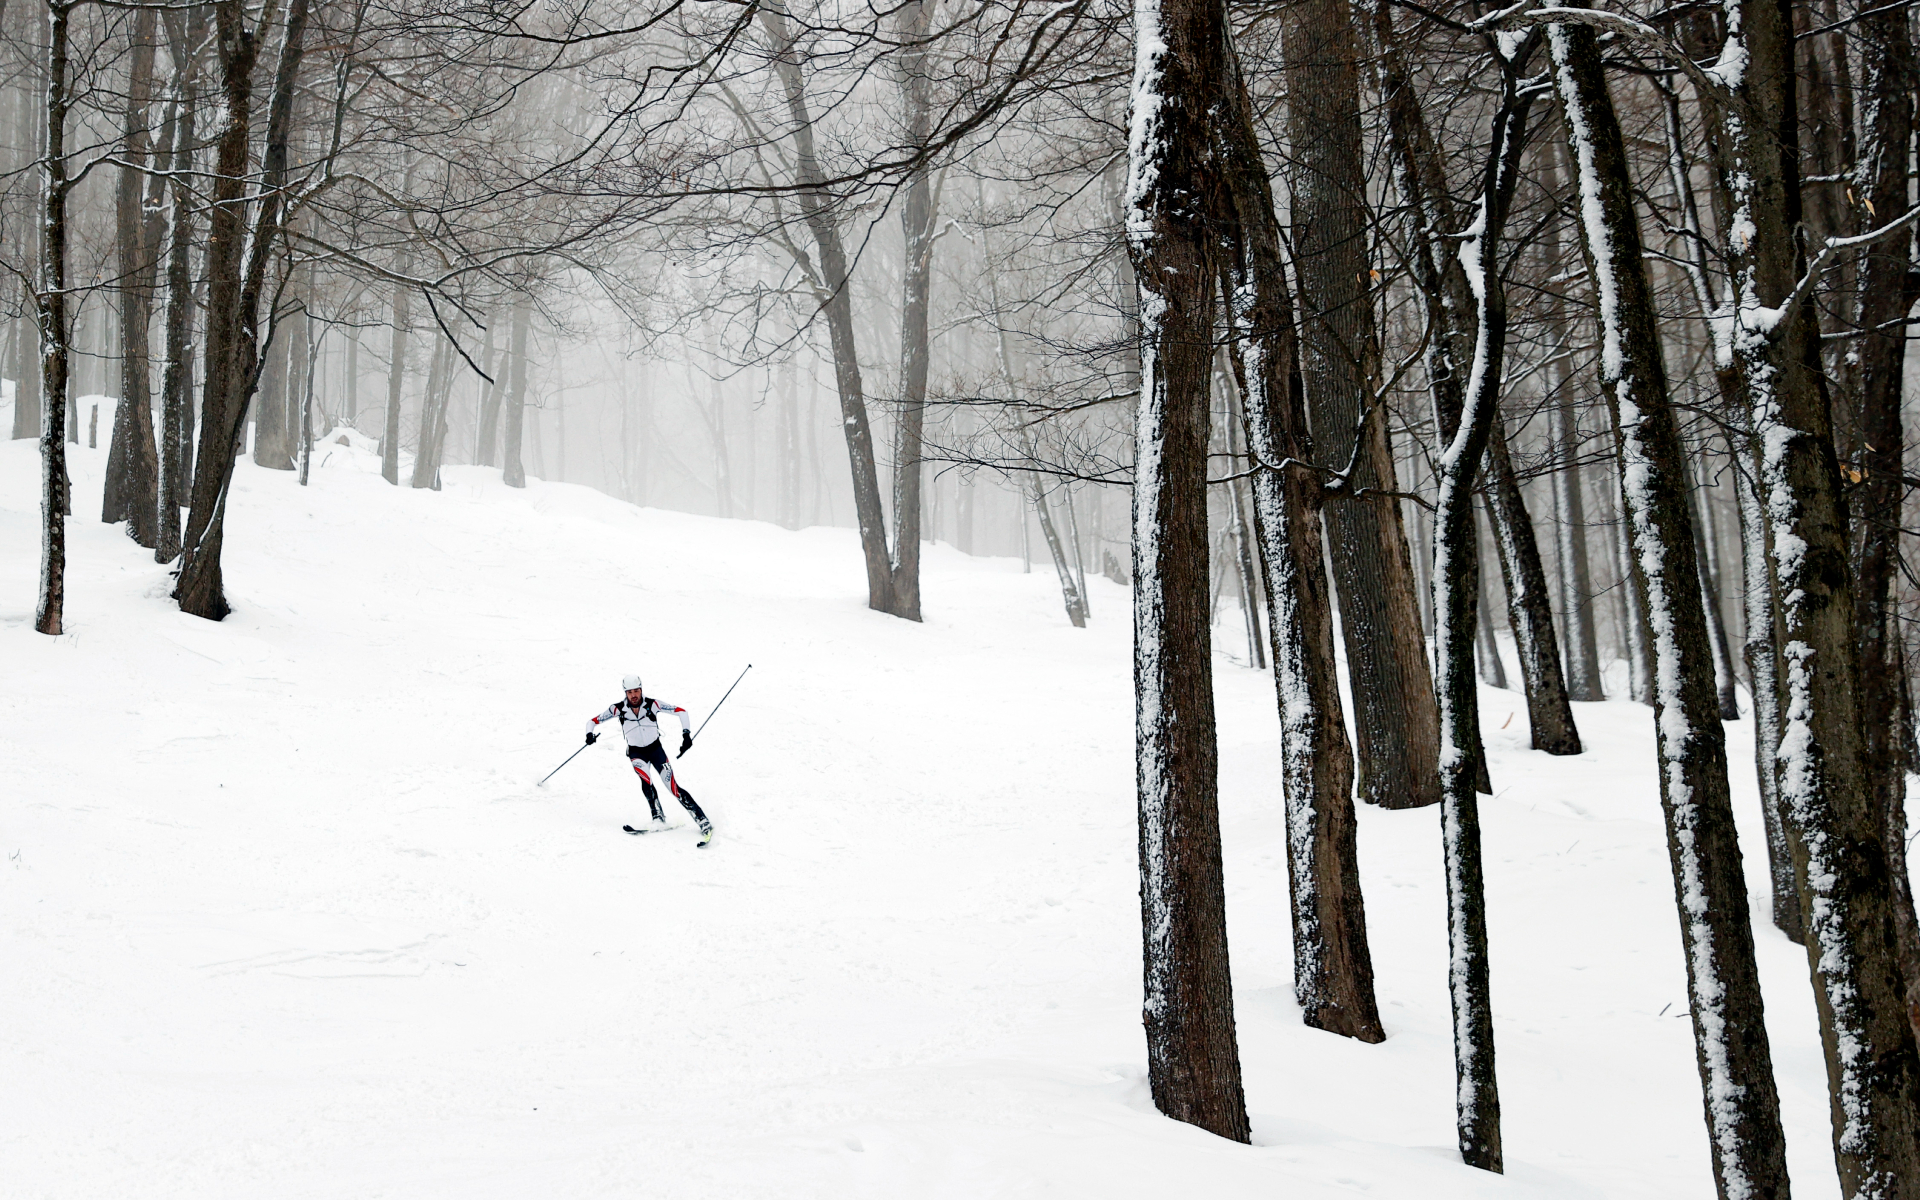 Фото: Maddie Meyer/Getty Images